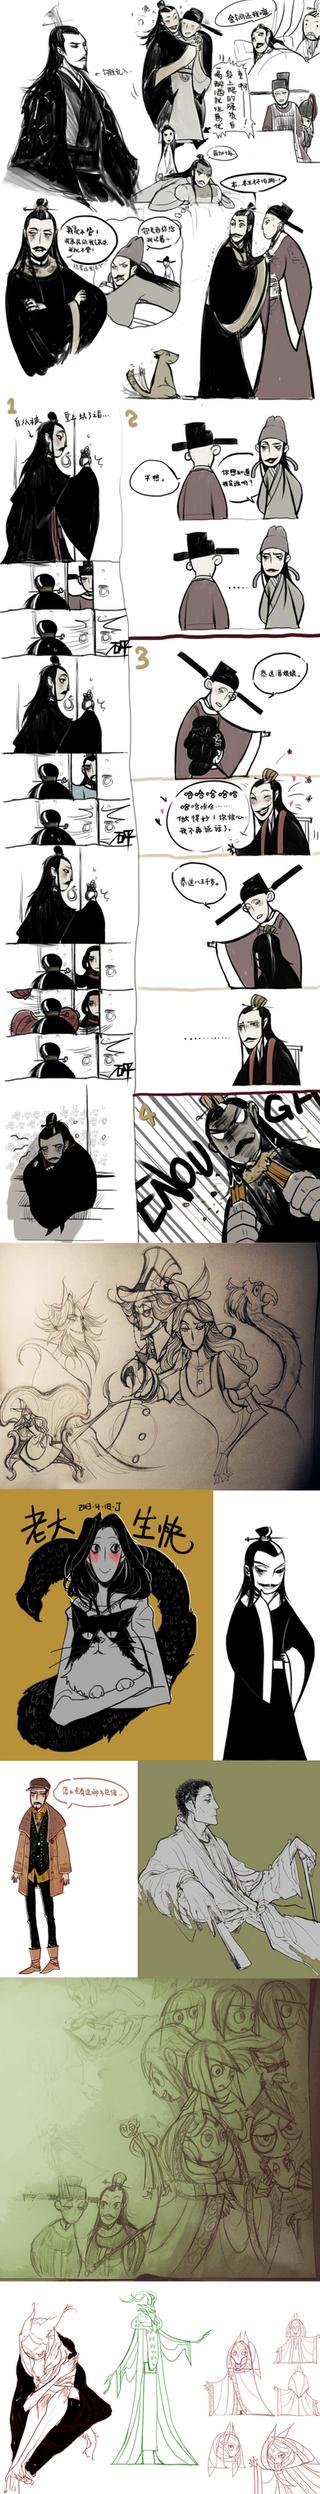 Sketchdump 4 by Wavesheep